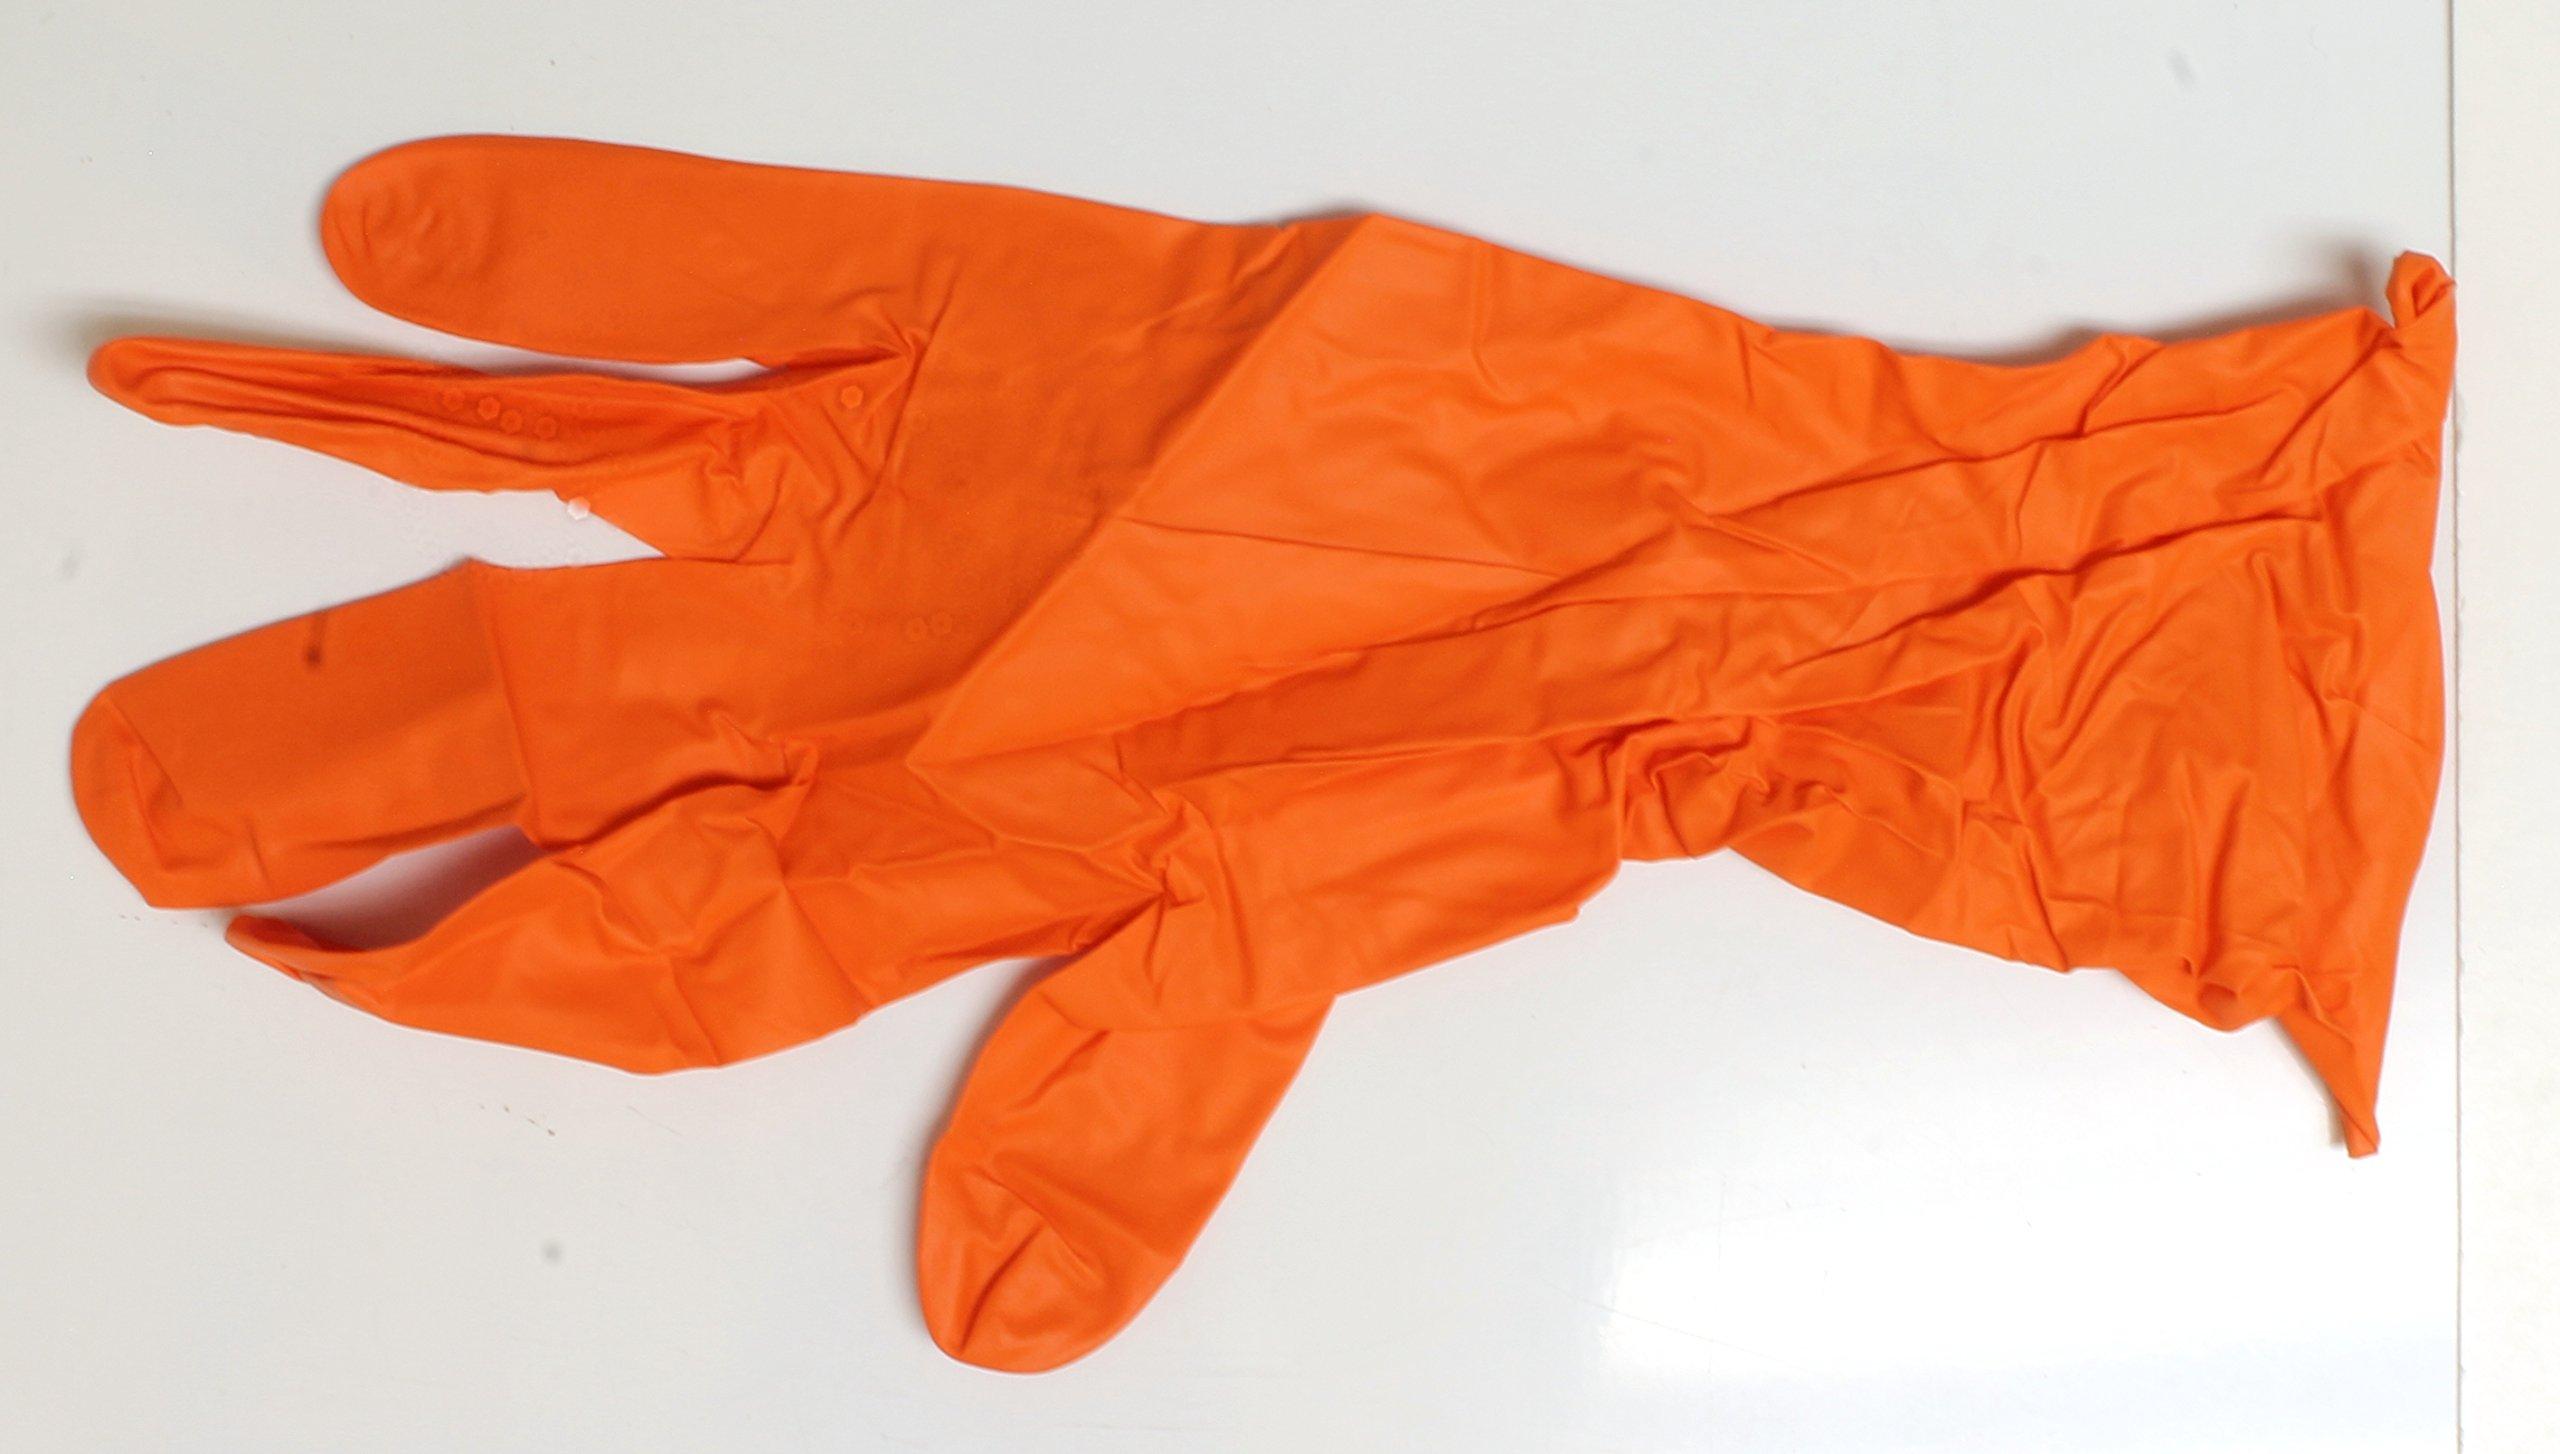 Bulk Nitrile Small Disposable Gloves Orange 5 Mil Box Of 300